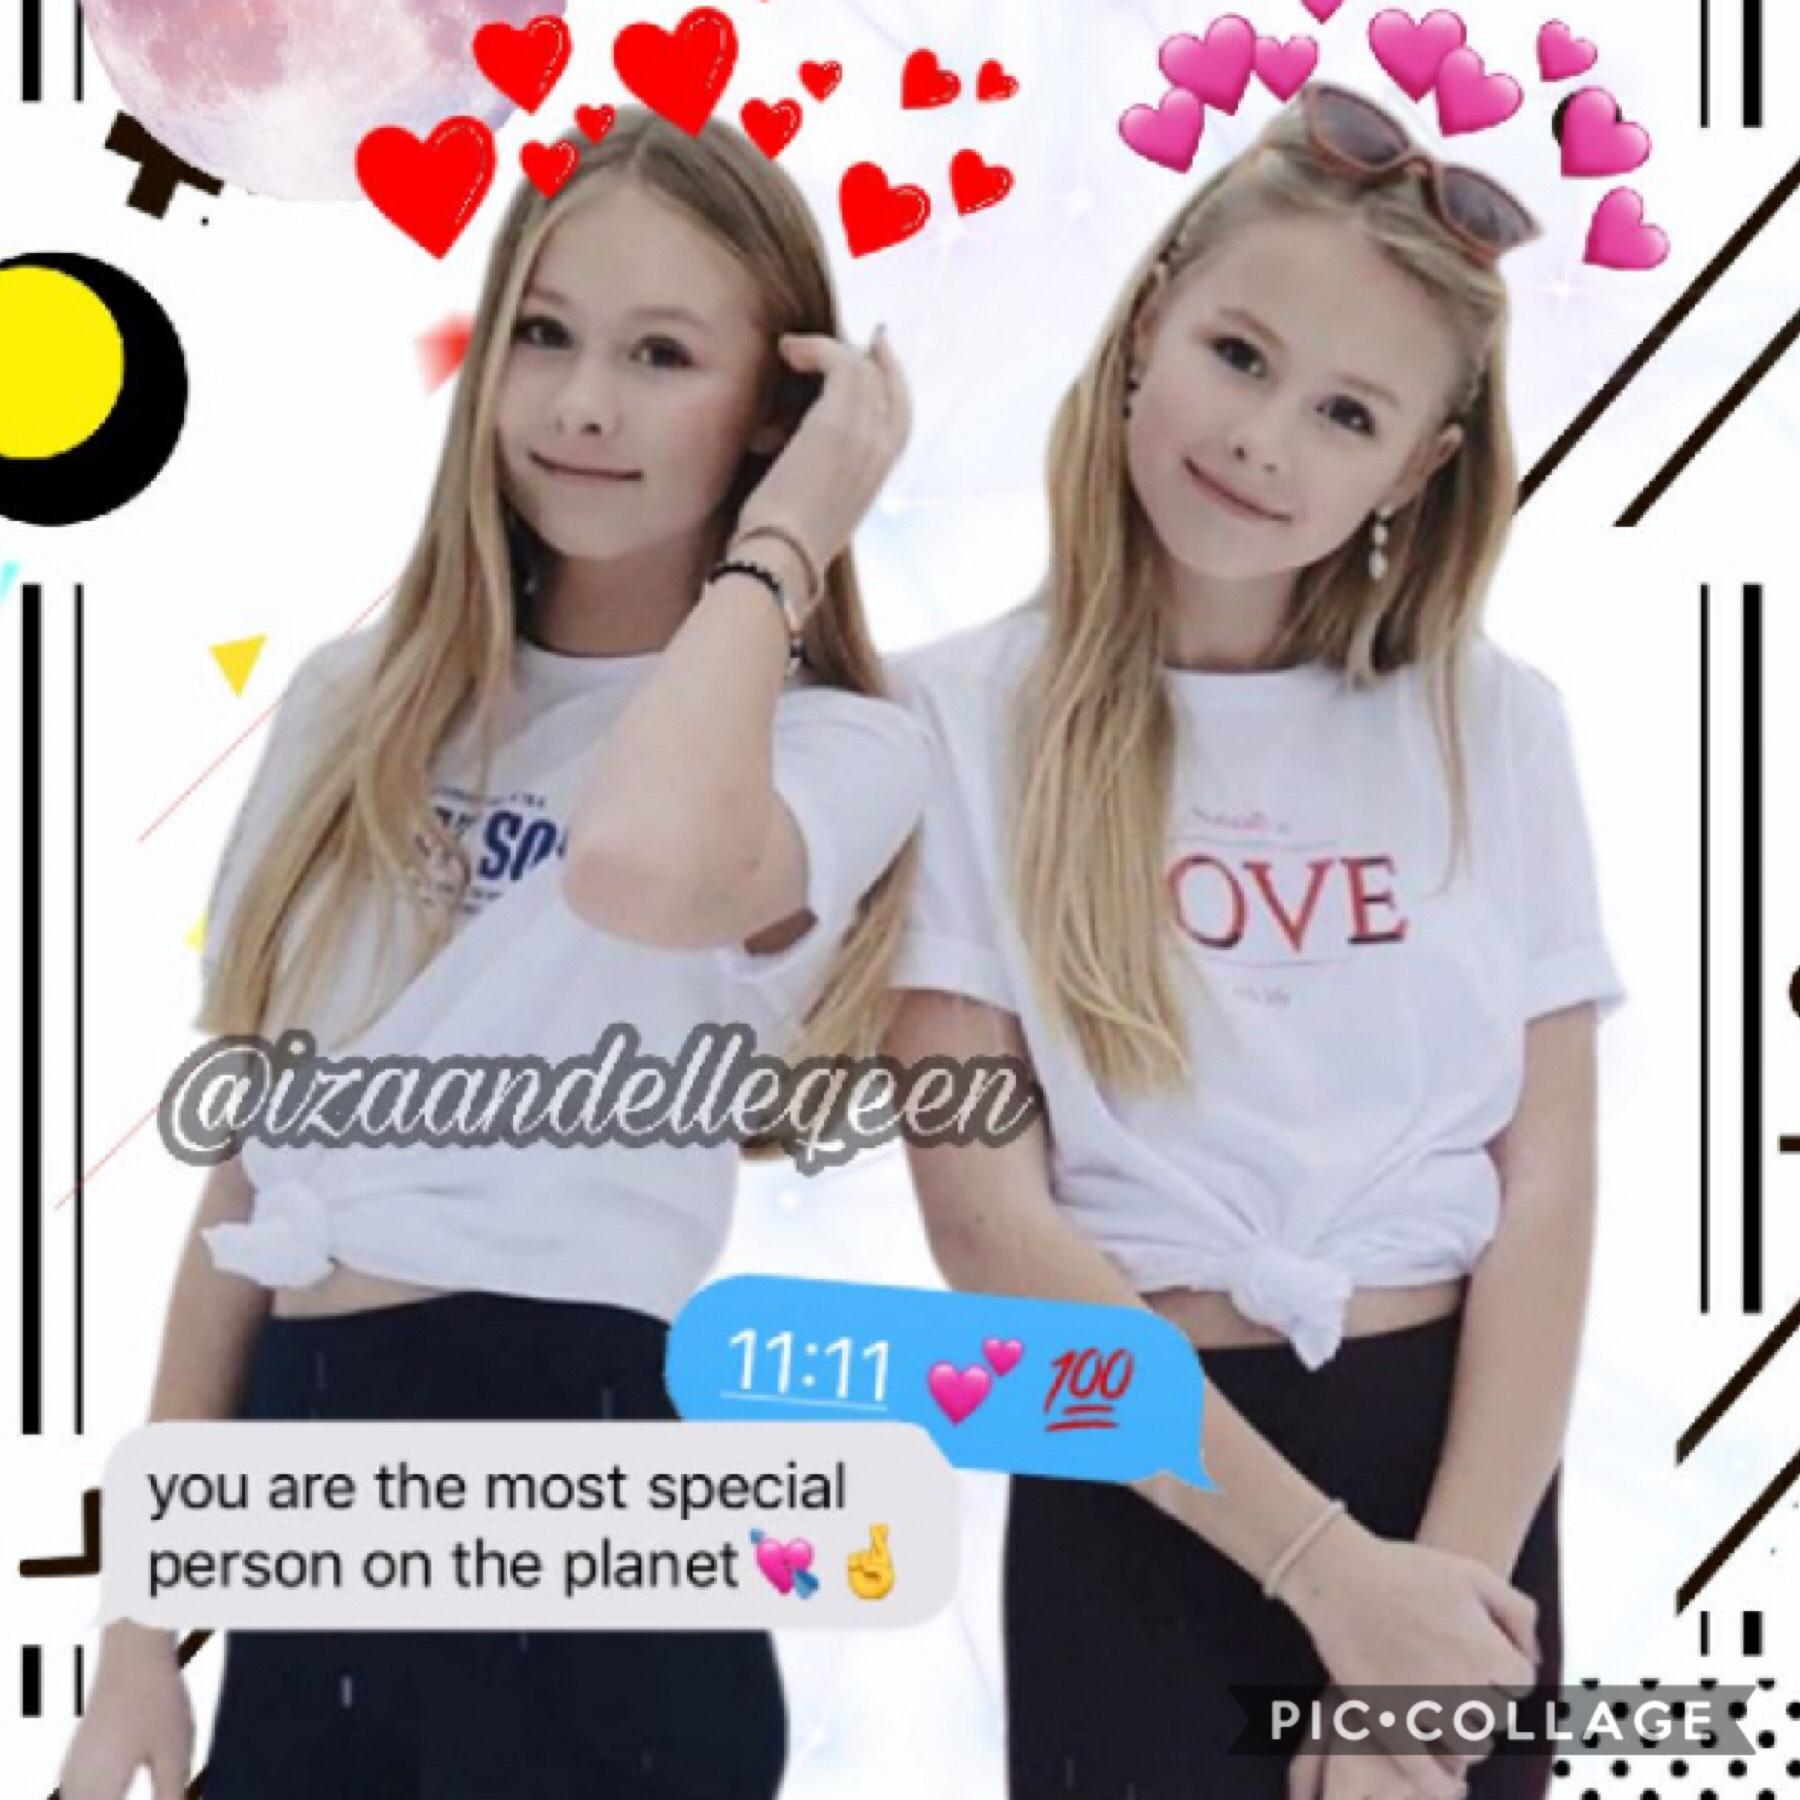 We love r fans they make the best edits thnxx for ur support@izaandellequeen💗💗💗